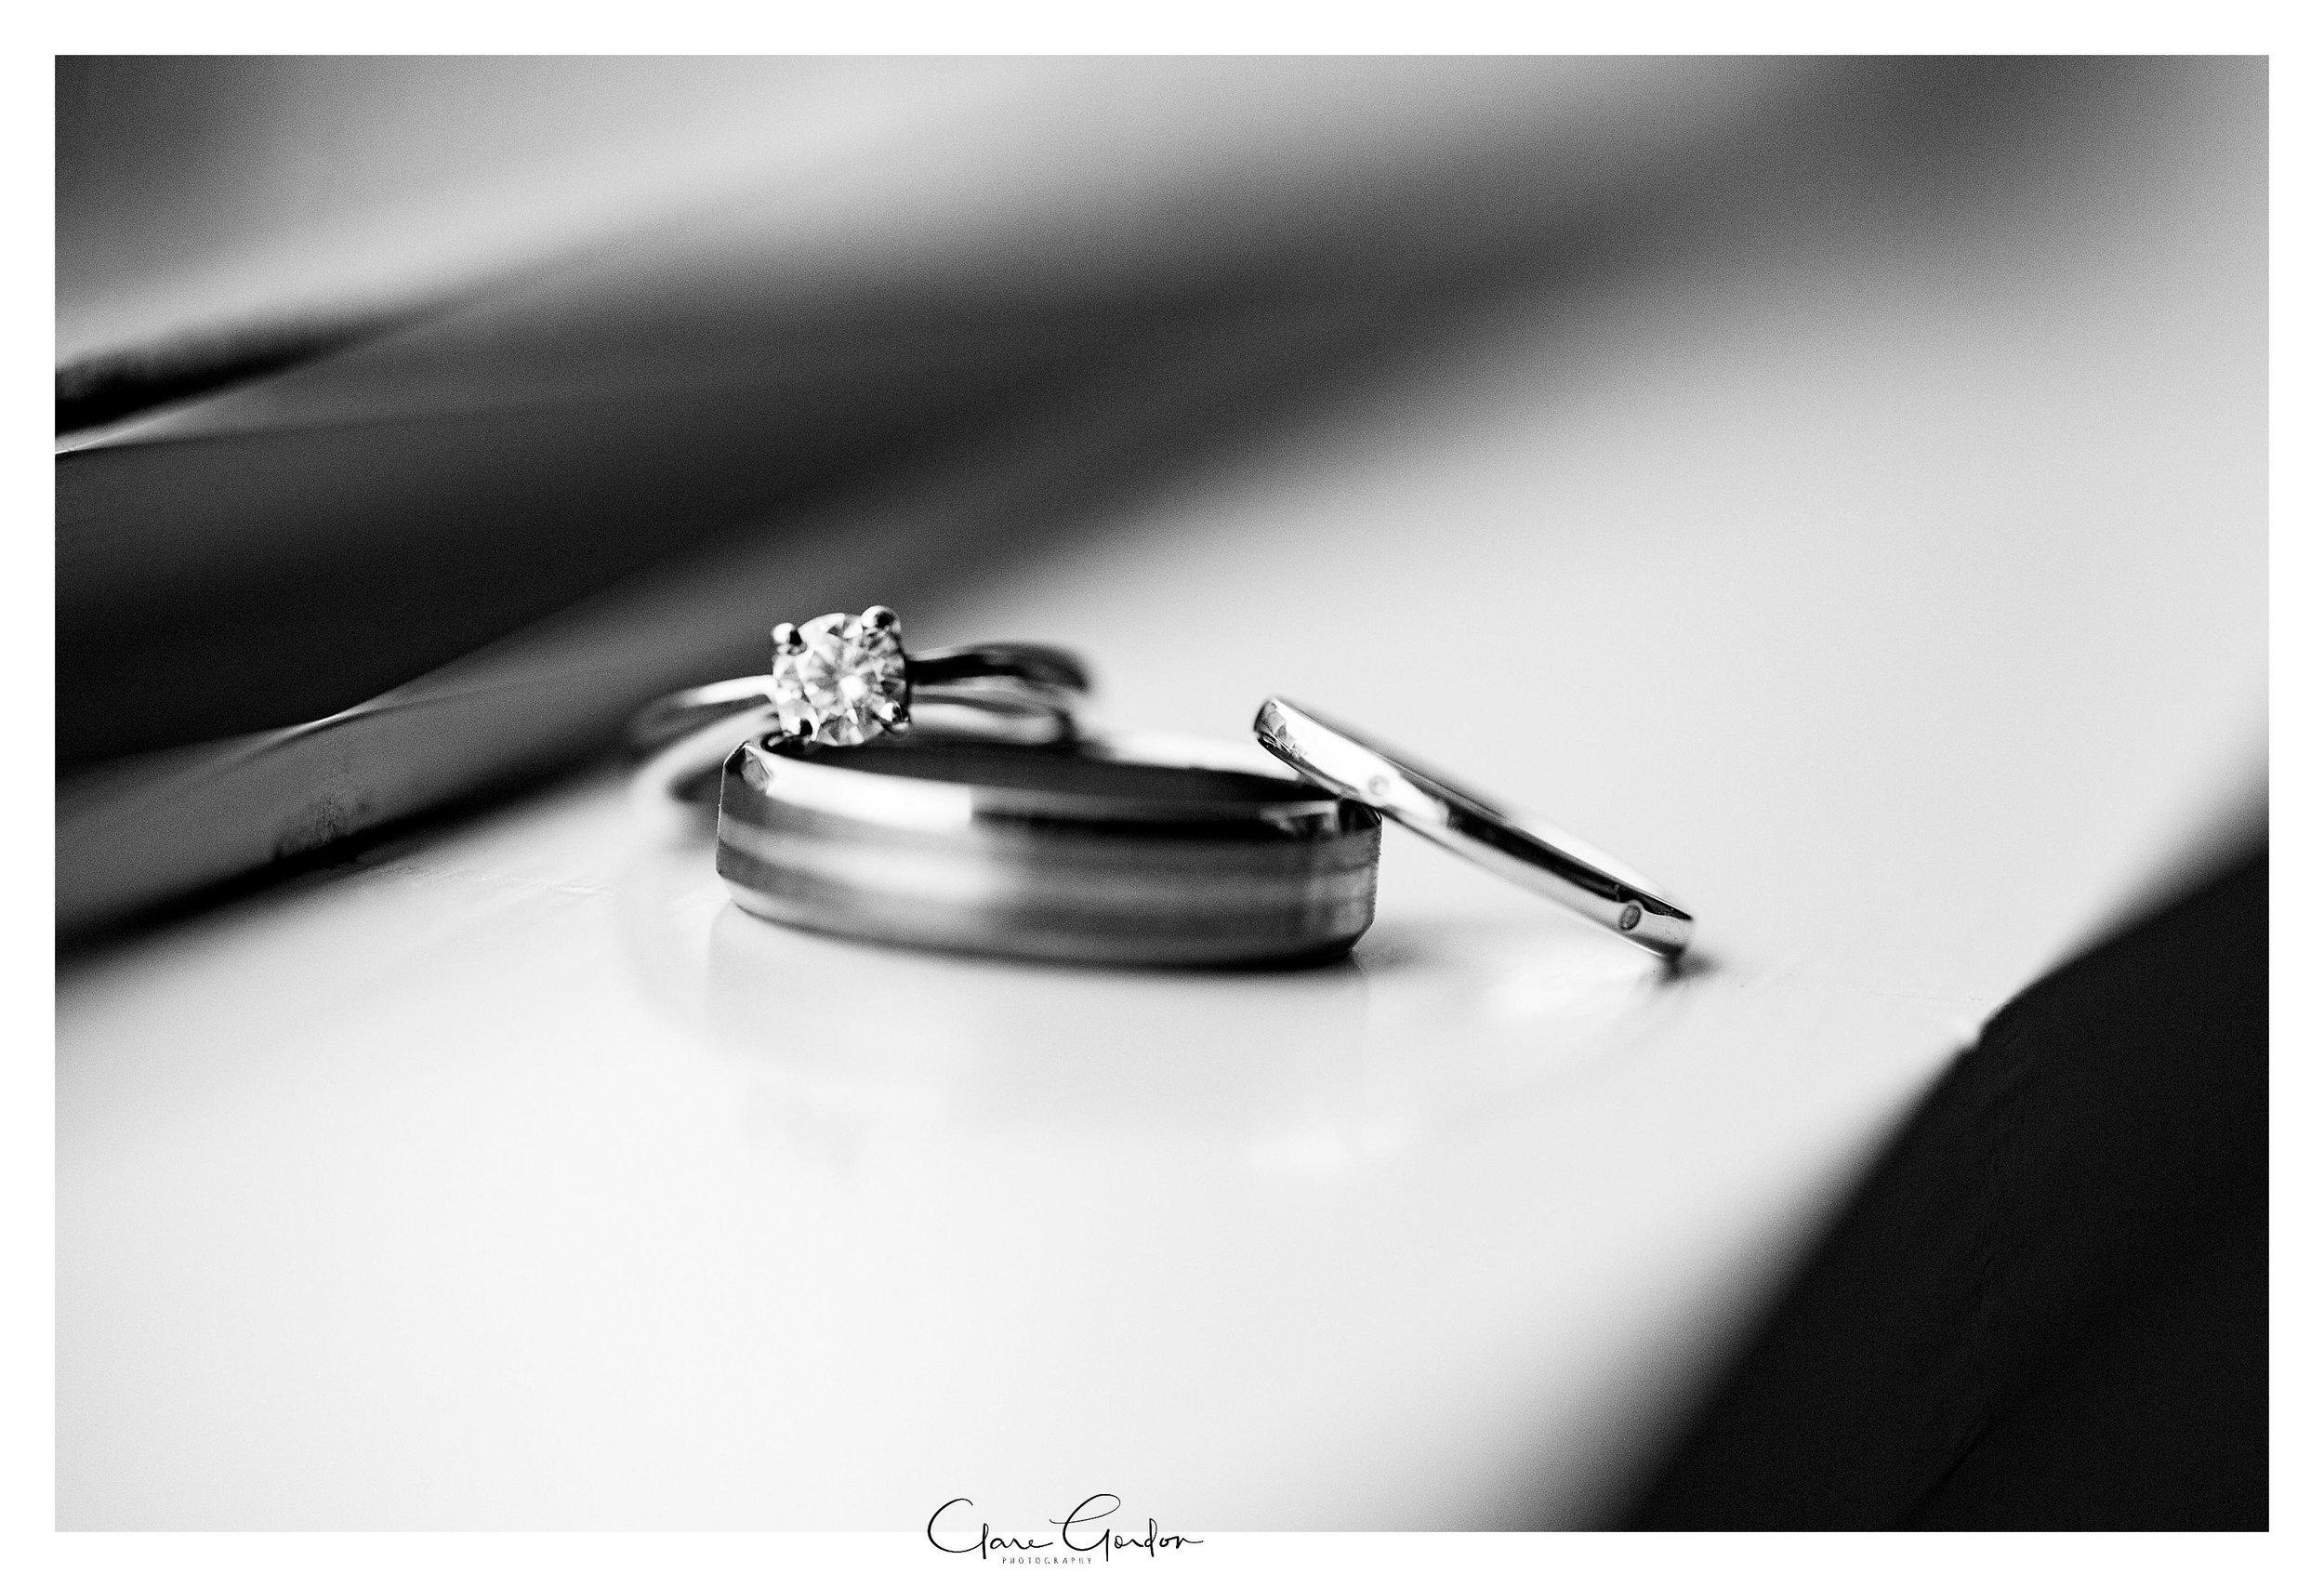 Hamilton-NZ-wedding-photographer-Bride-reflection-Waikato-wedding-photographer-Novotel-Hamilton-Clare-Gordon-photography (12).jpg